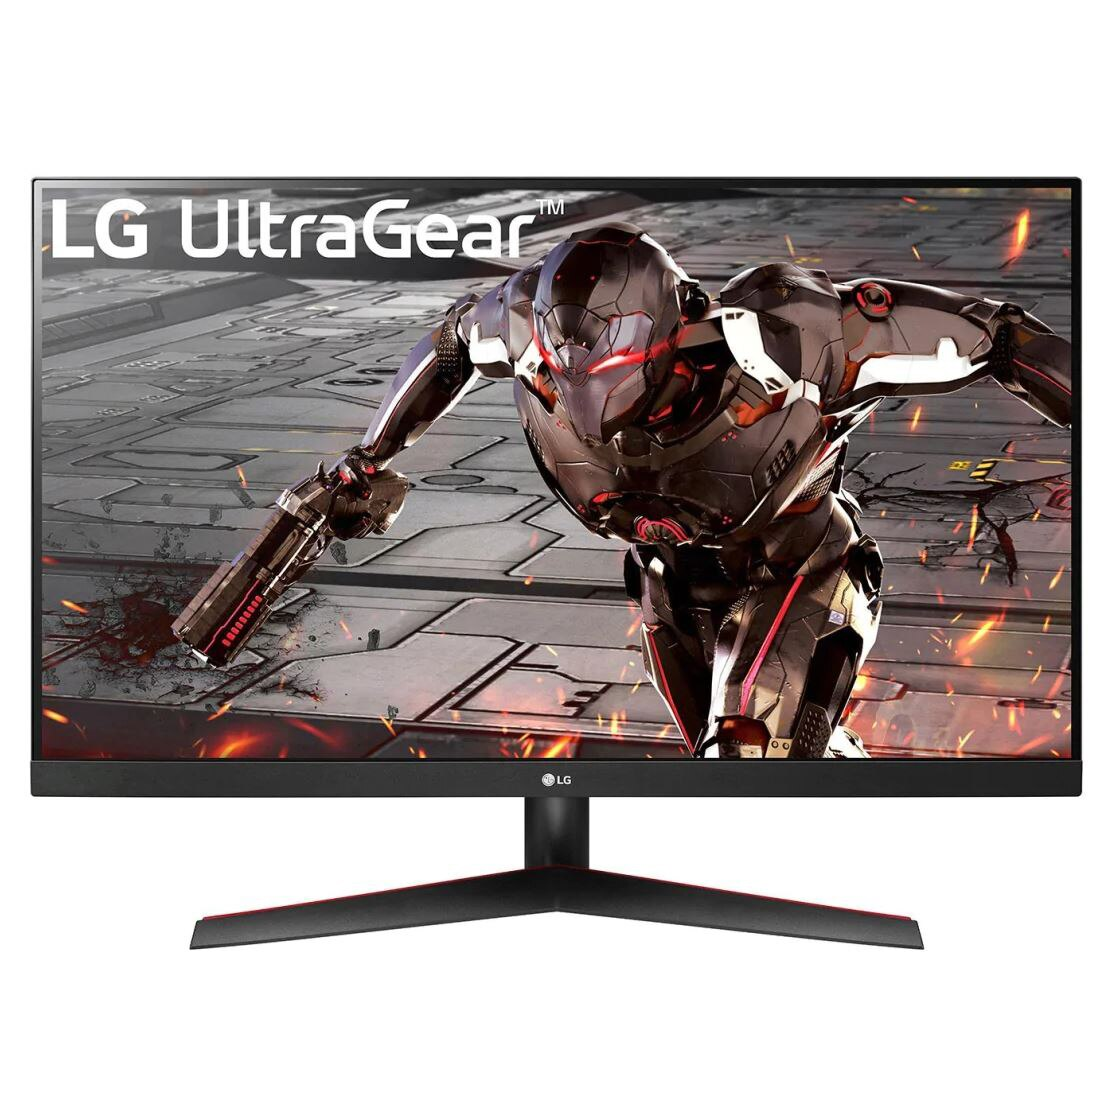 Fotografie Monitor Gaming LED VA LG UltraGear 31.5', QHD, 165Hz, 1ms, HDR10, FreeSync, Display Port, HDMI, 32GN600